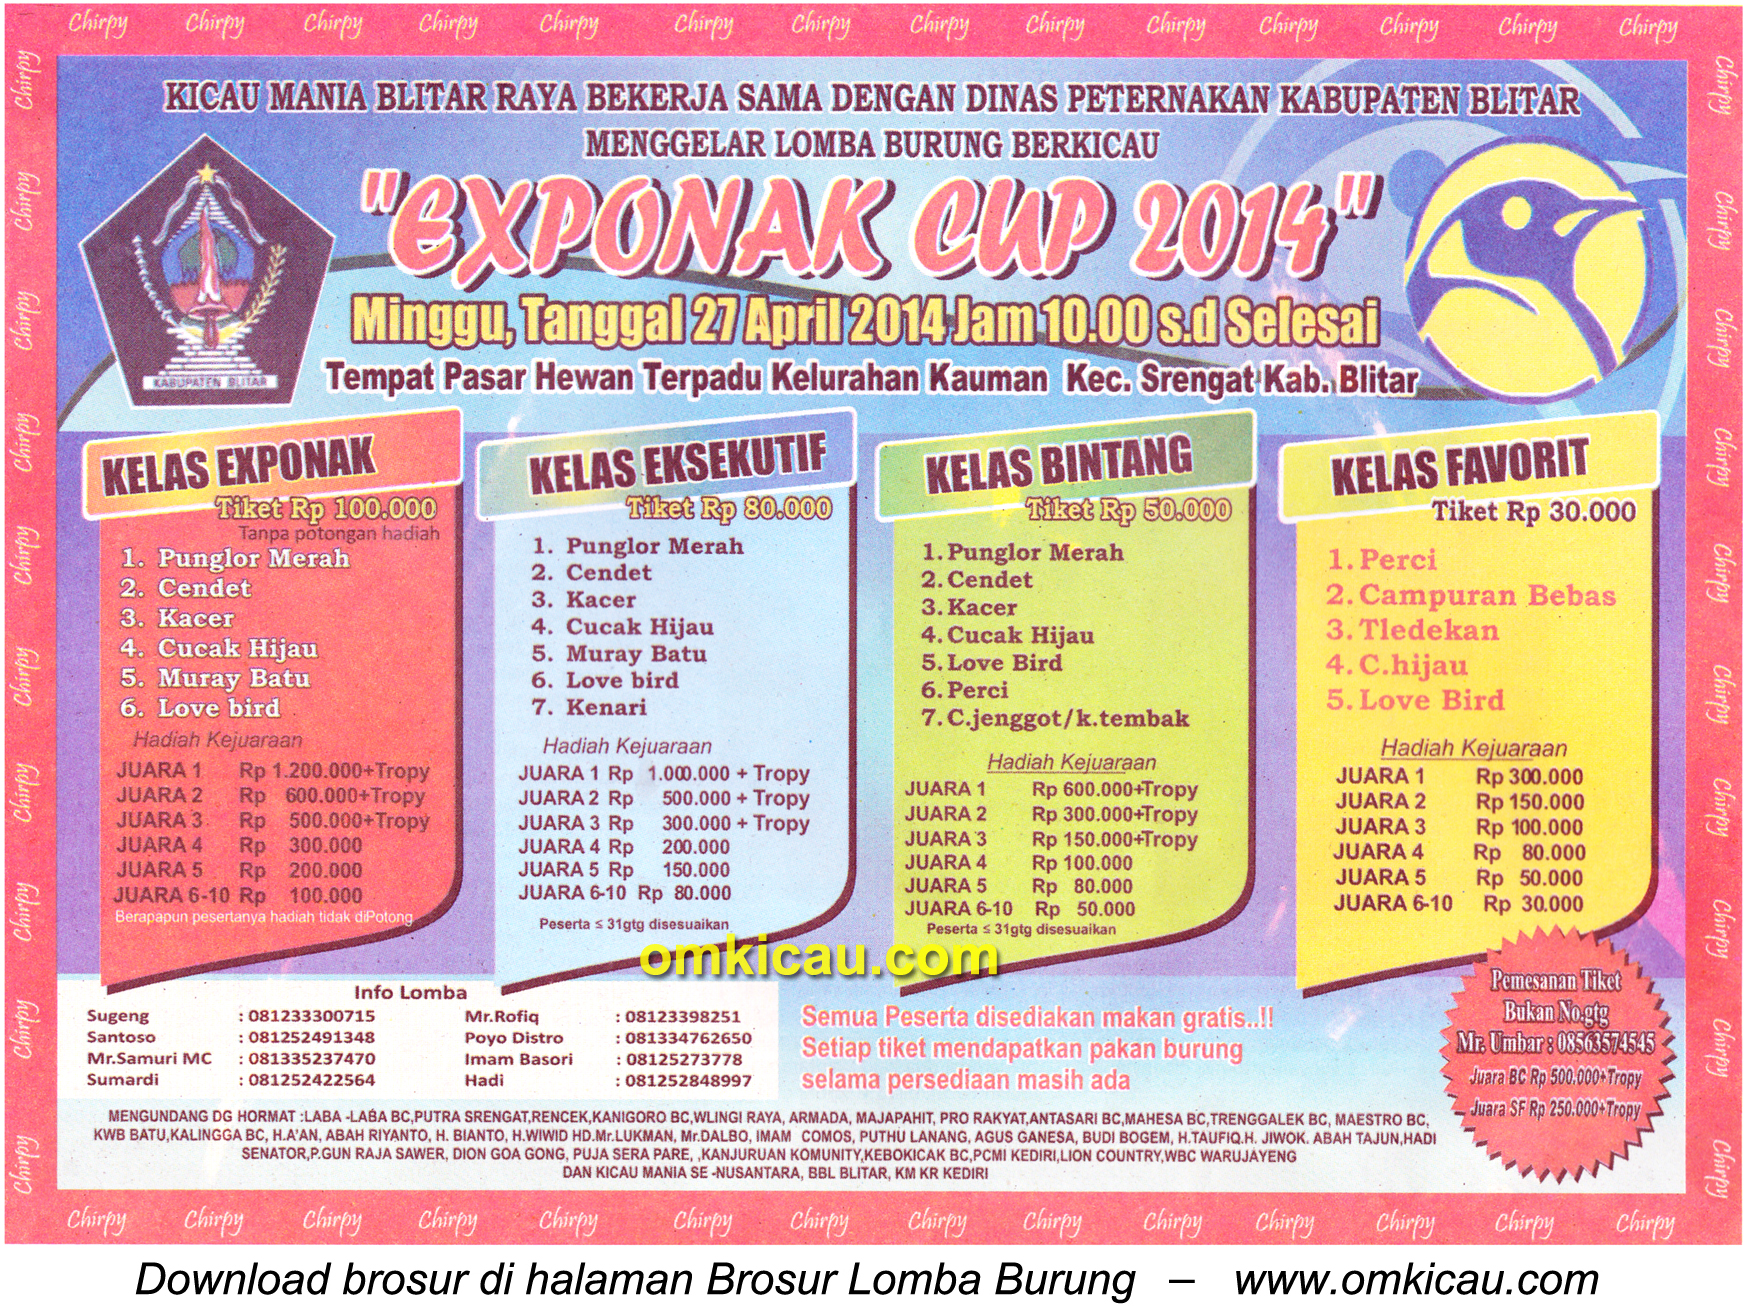 Brosur Lomba Burung Berkicau Exponak Cup, Blitar, 27 April 2014